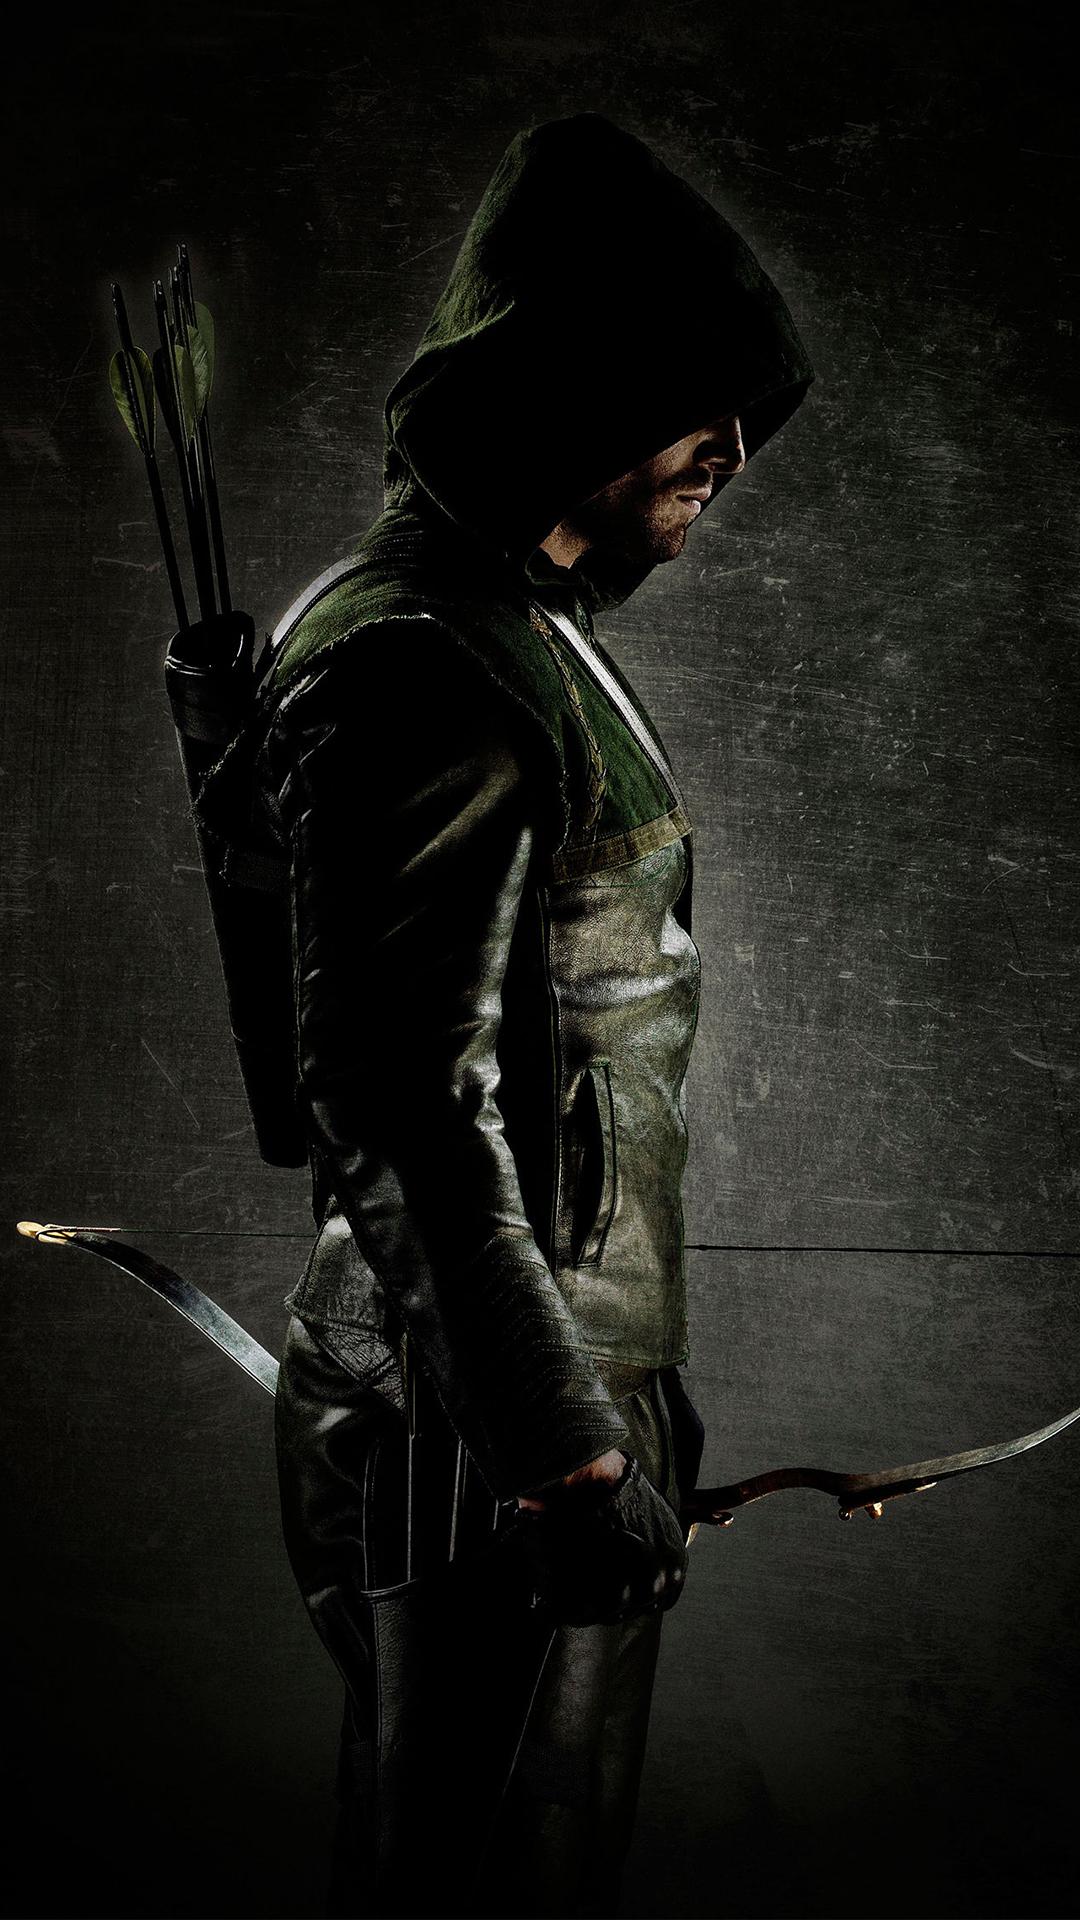 Must see Wallpaper Movie Arrow - arrow-3696  Image_676867.jpg